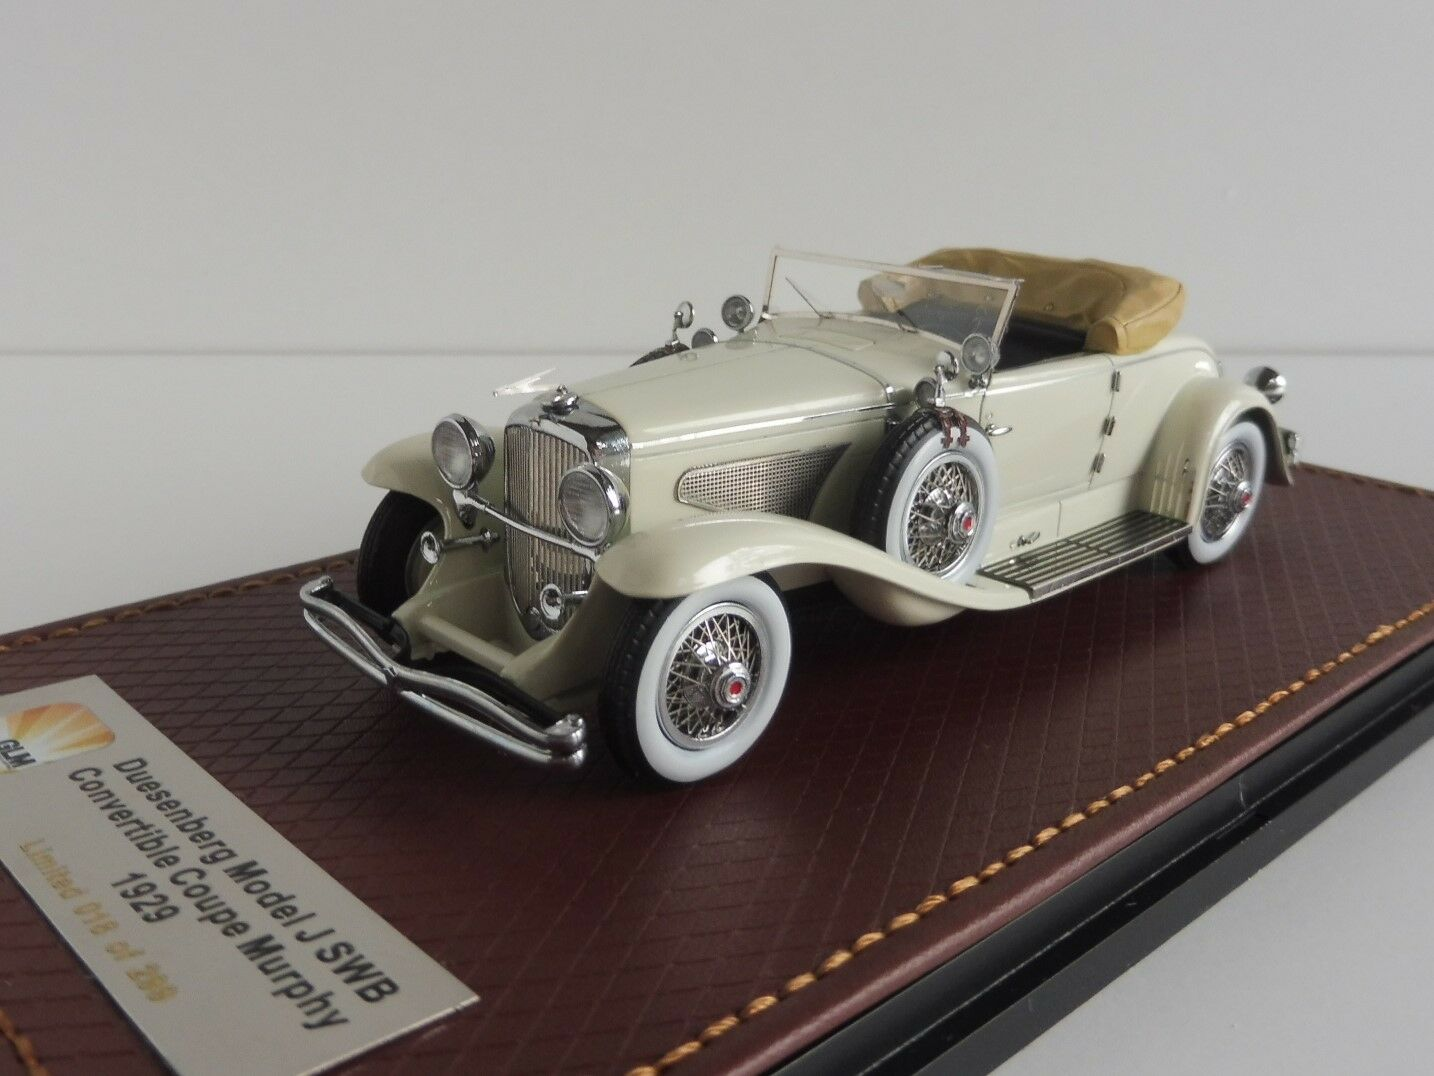 Duesenberg modelo j SWB Murphy 1929 142-2165 1 43 glm-151001 converdeible coupe